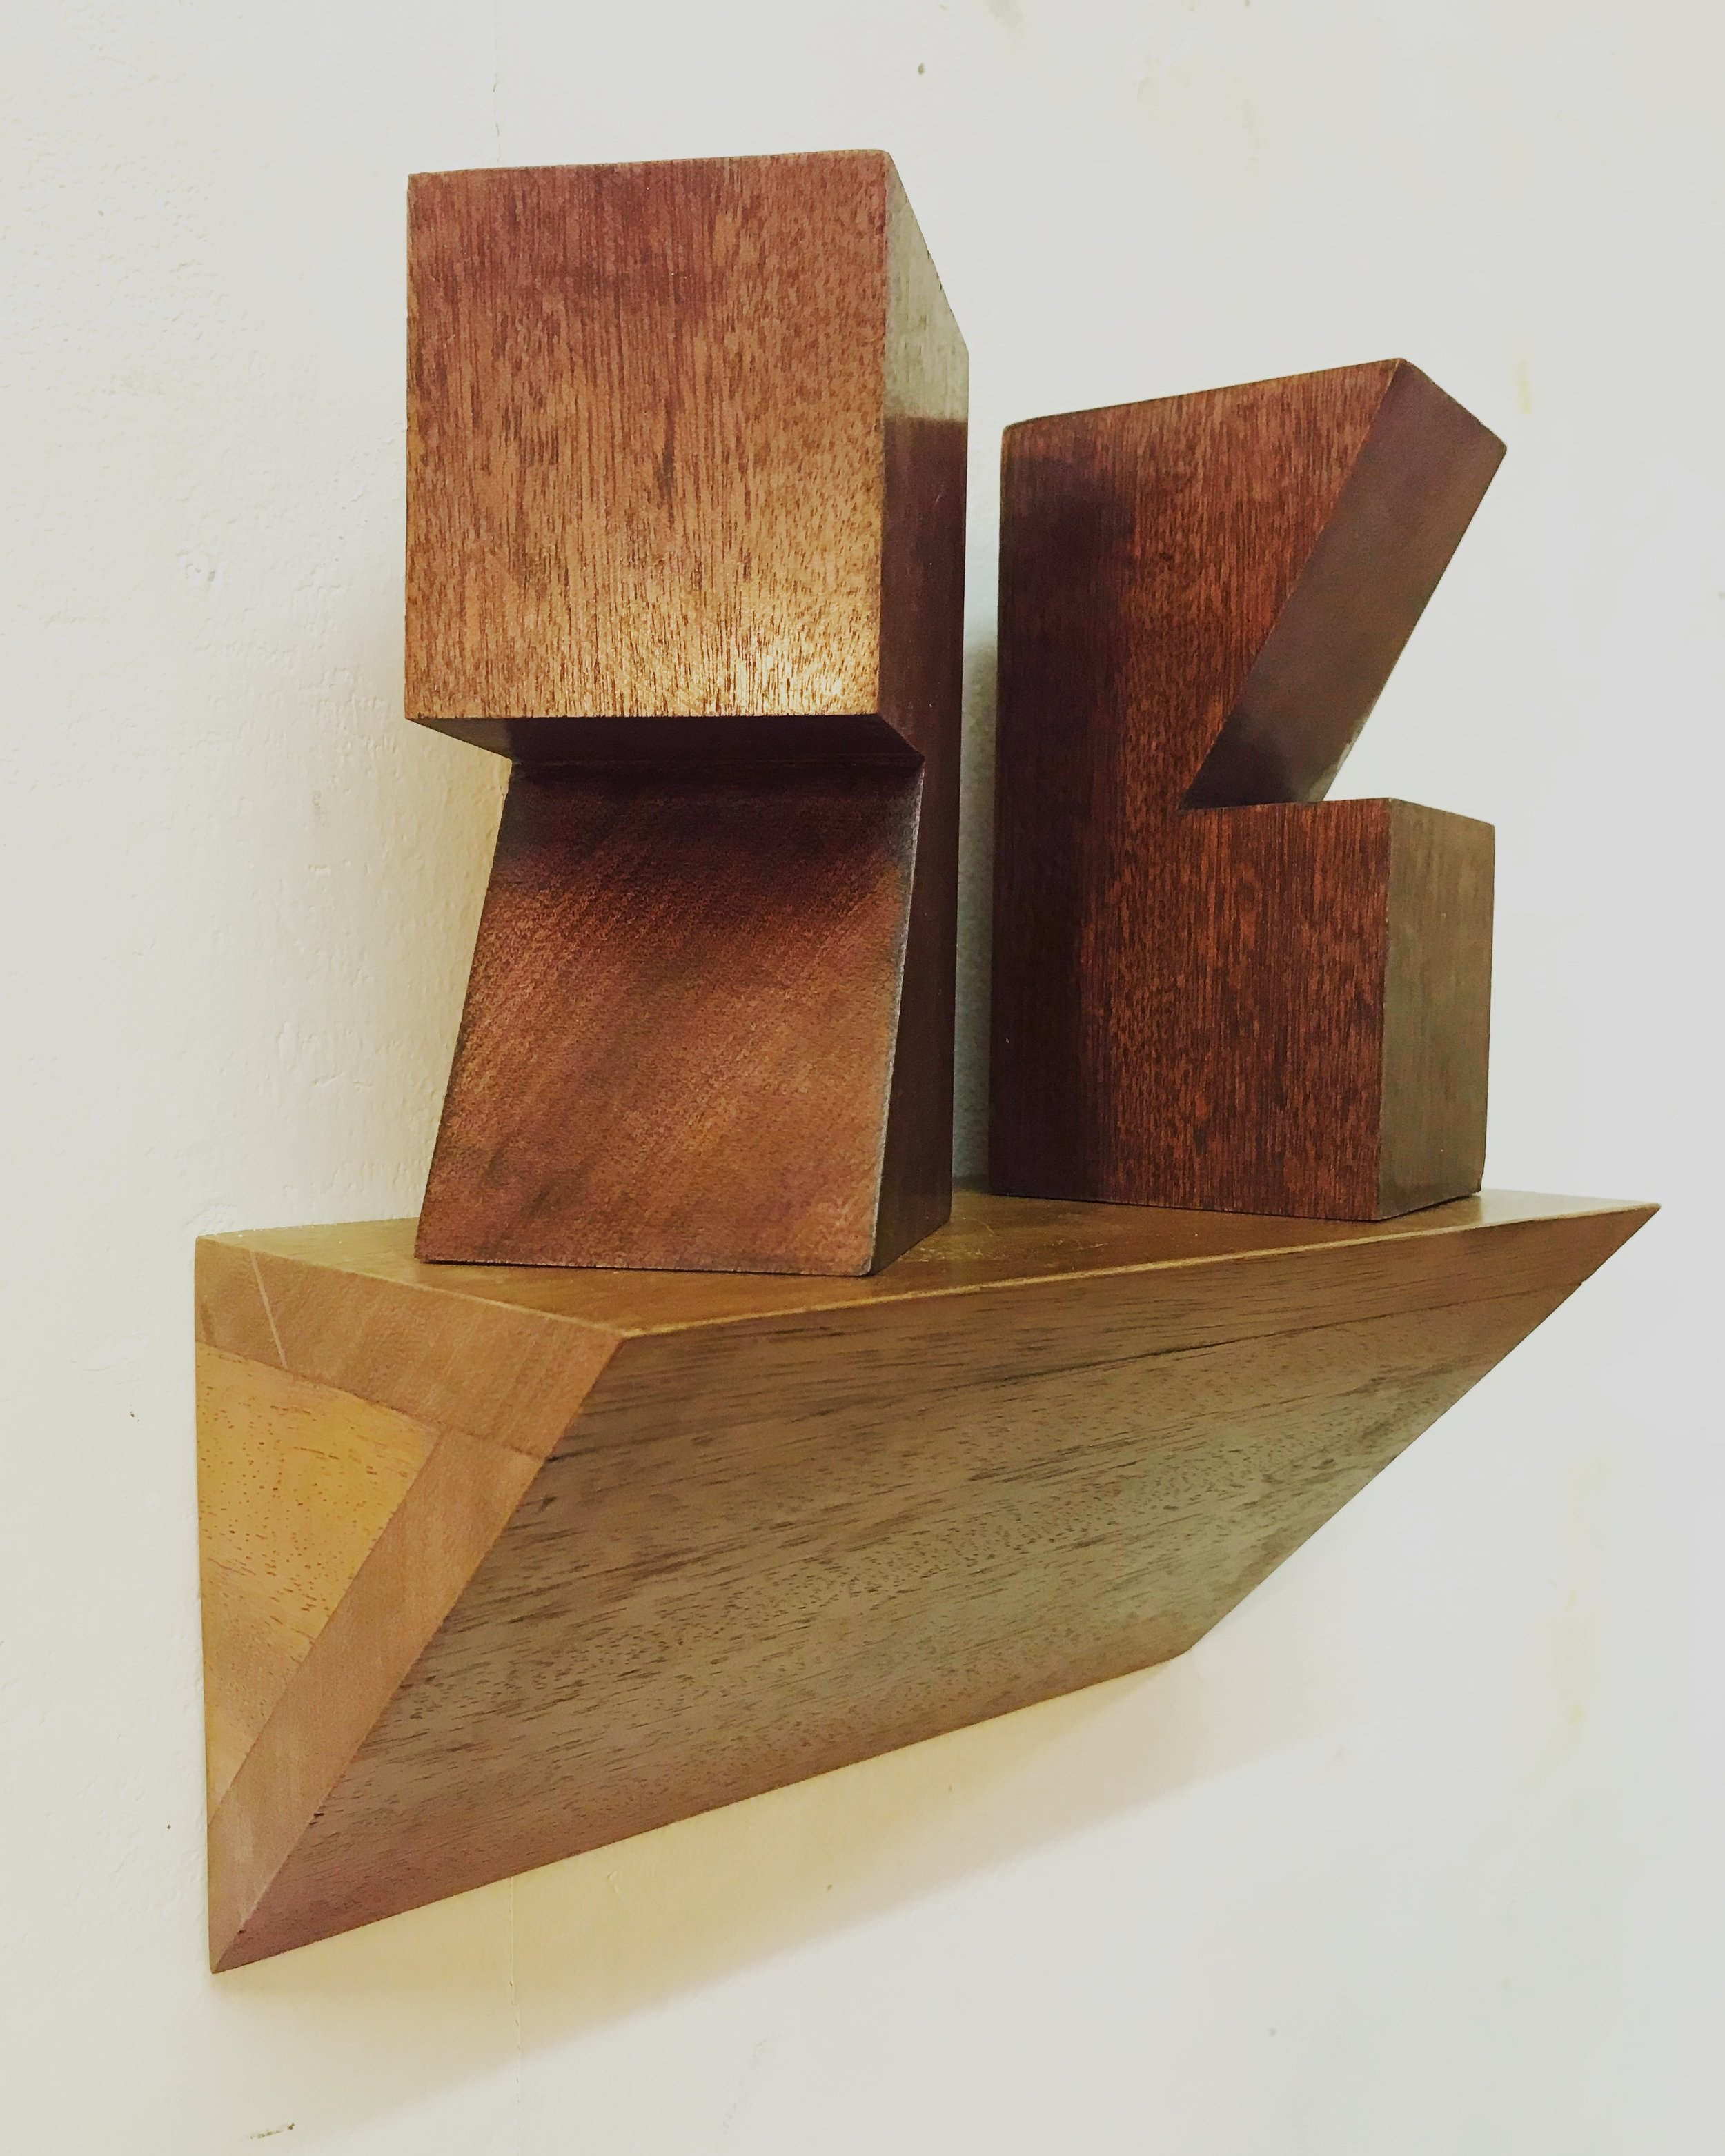 'Overlook', Sapele & Iroko wood, 25x12x30cm